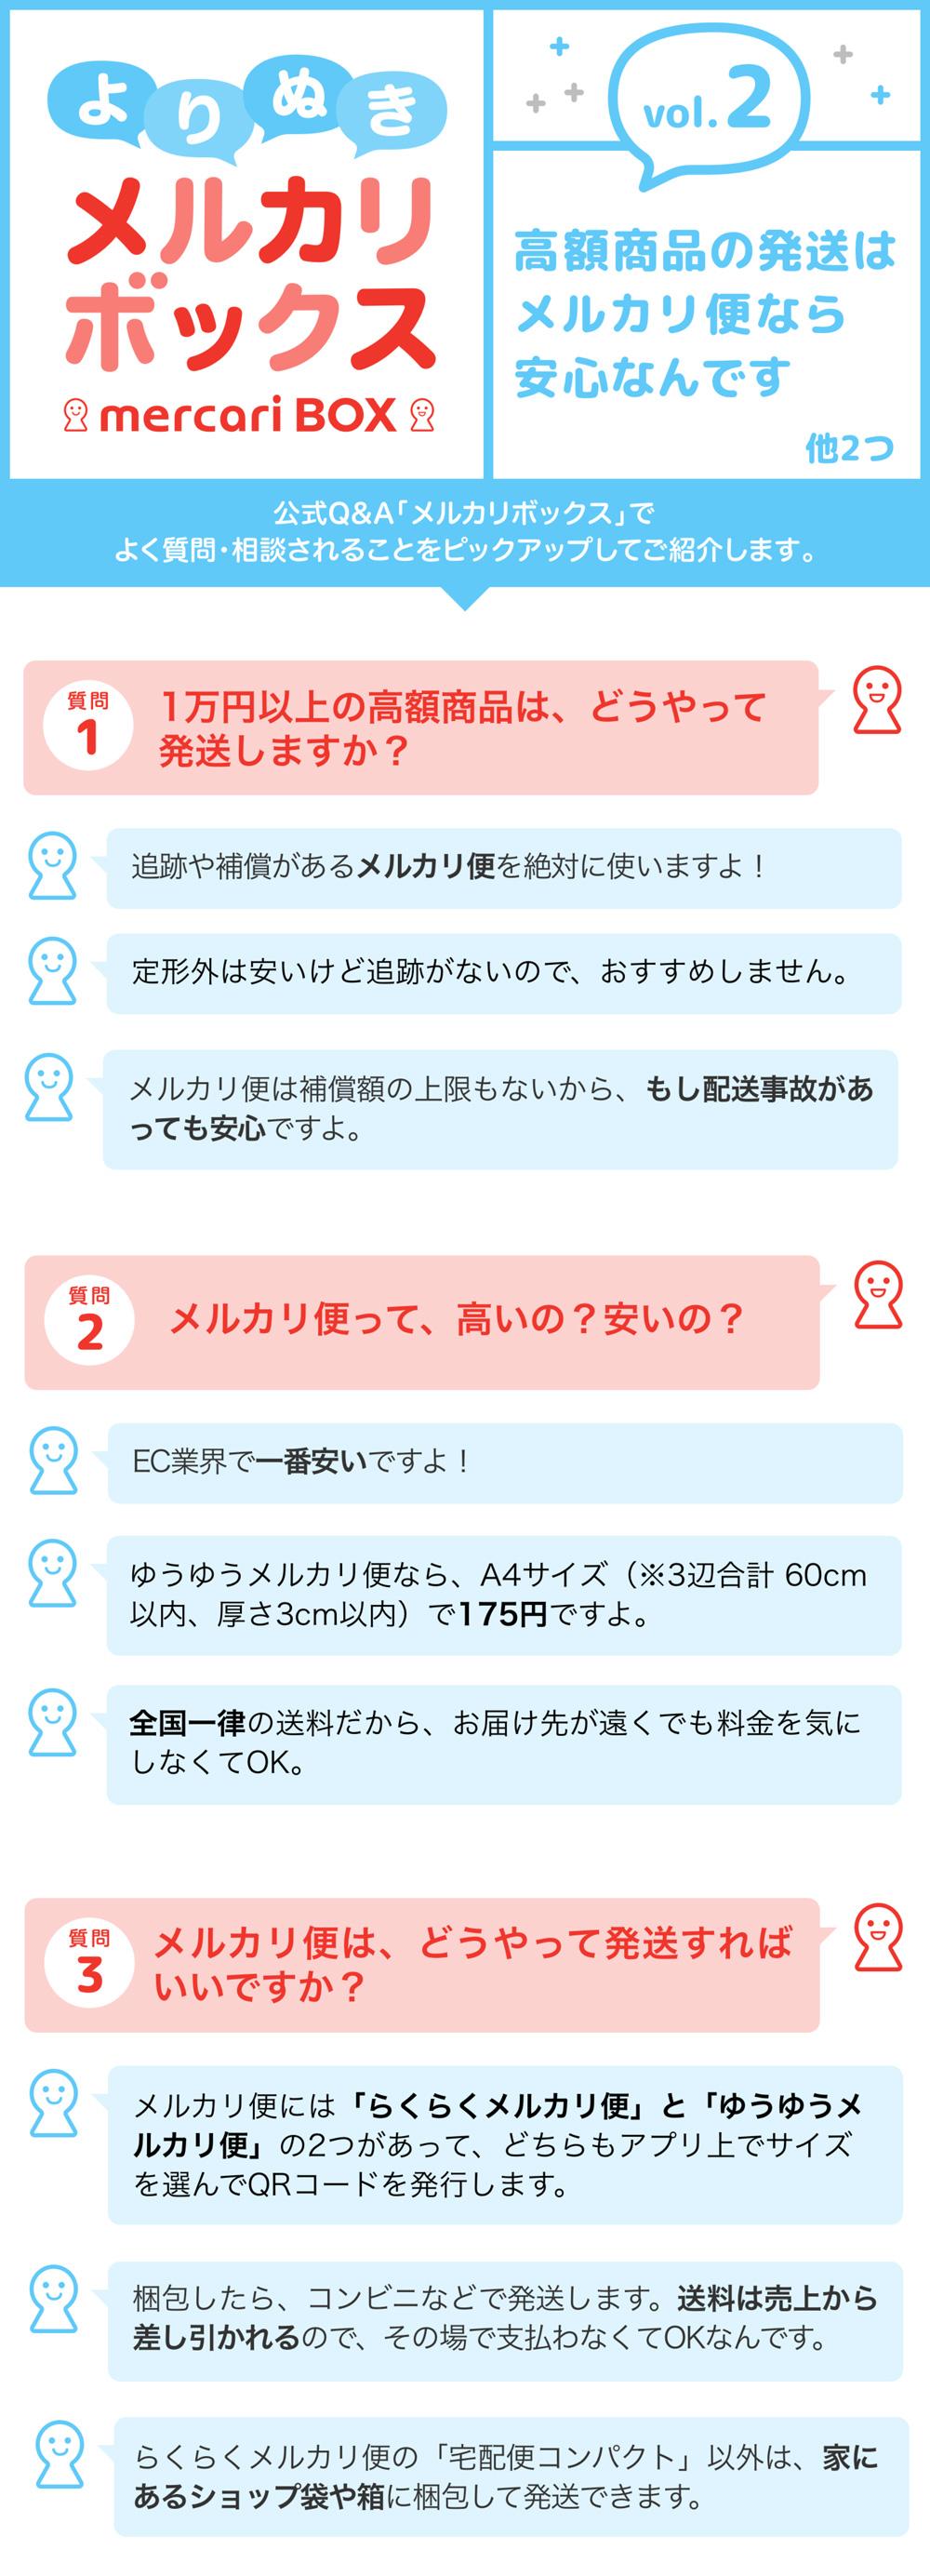 yoribo.jpg